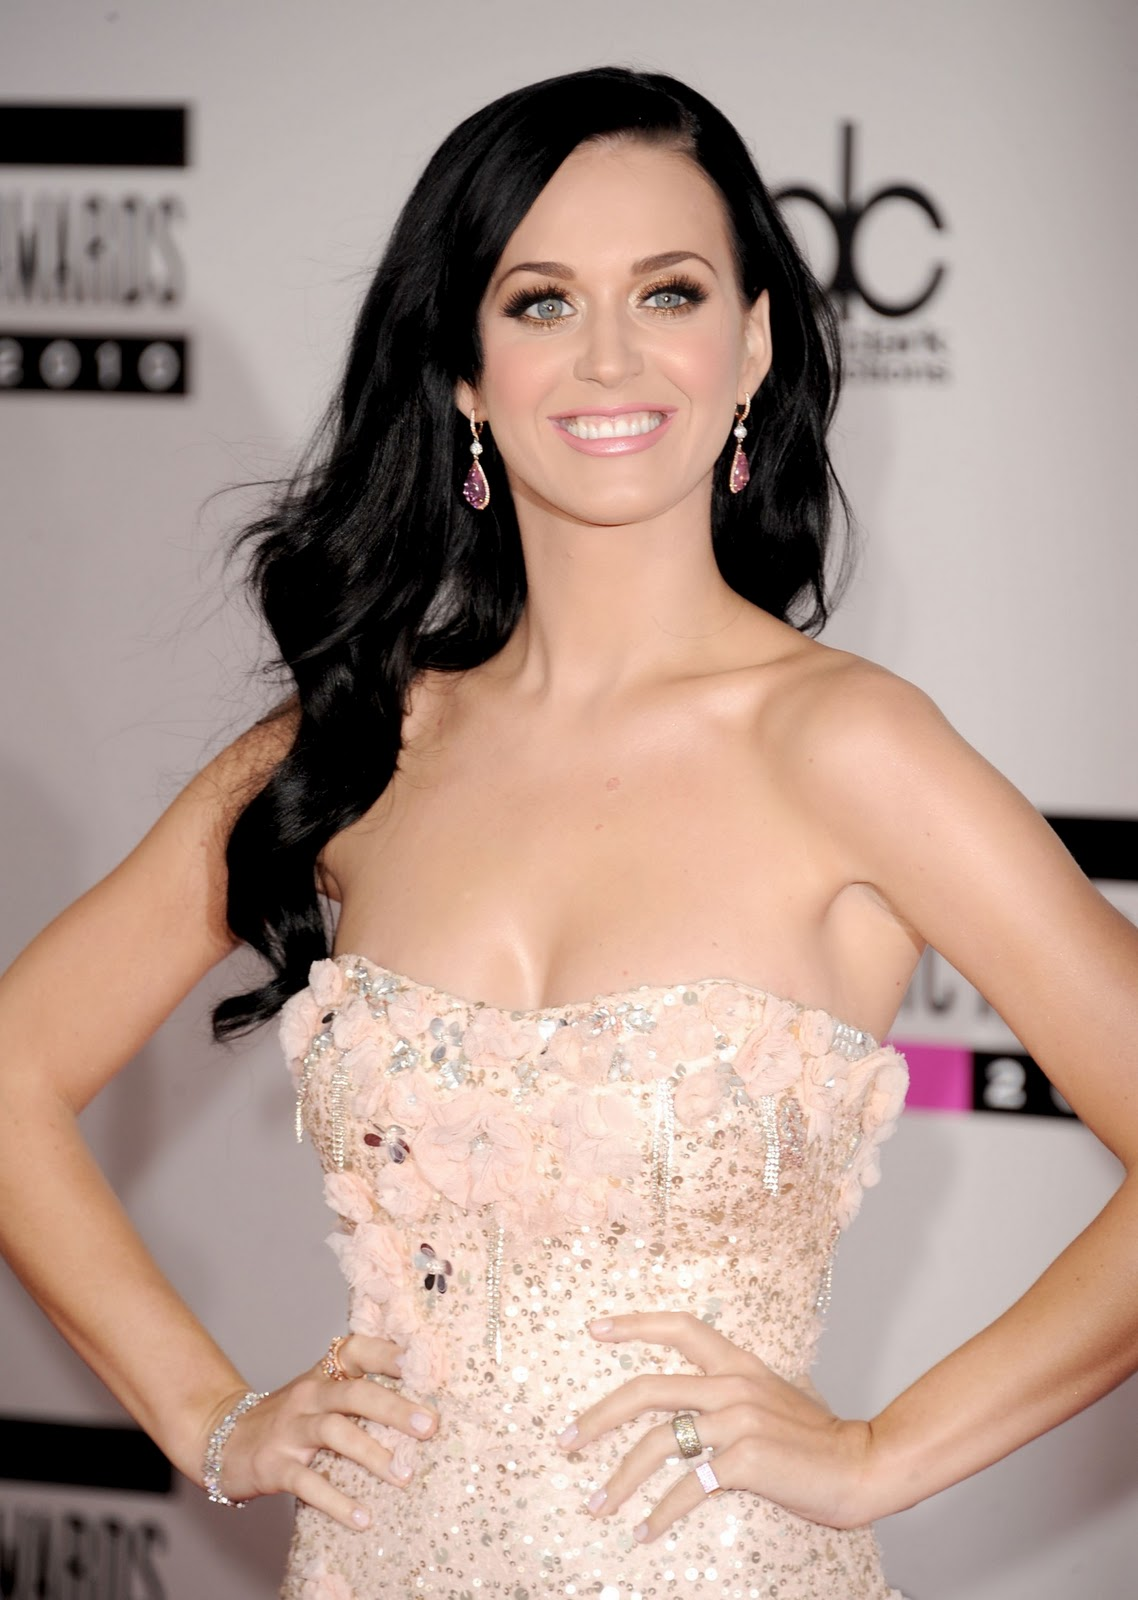 http://4.bp.blogspot.com/_48YMTKPyEMI/TOwhgo8IRLI/AAAAAAAAAMA/jZBViUXeZPM/s1600/Katy-Perry-125.jpg